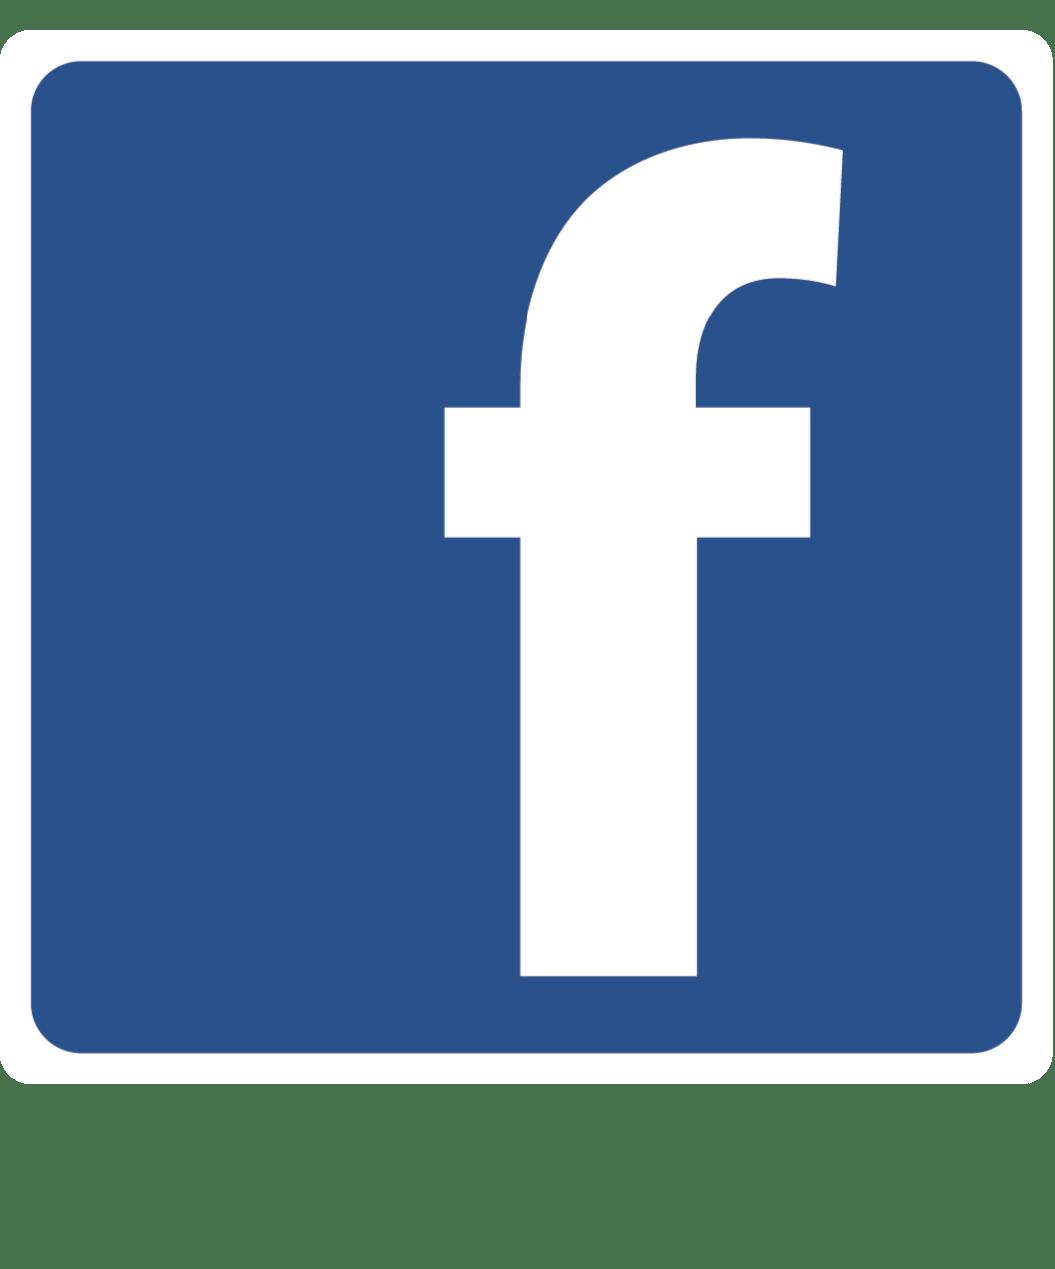 Facebook - Free social media icons - Flaticon